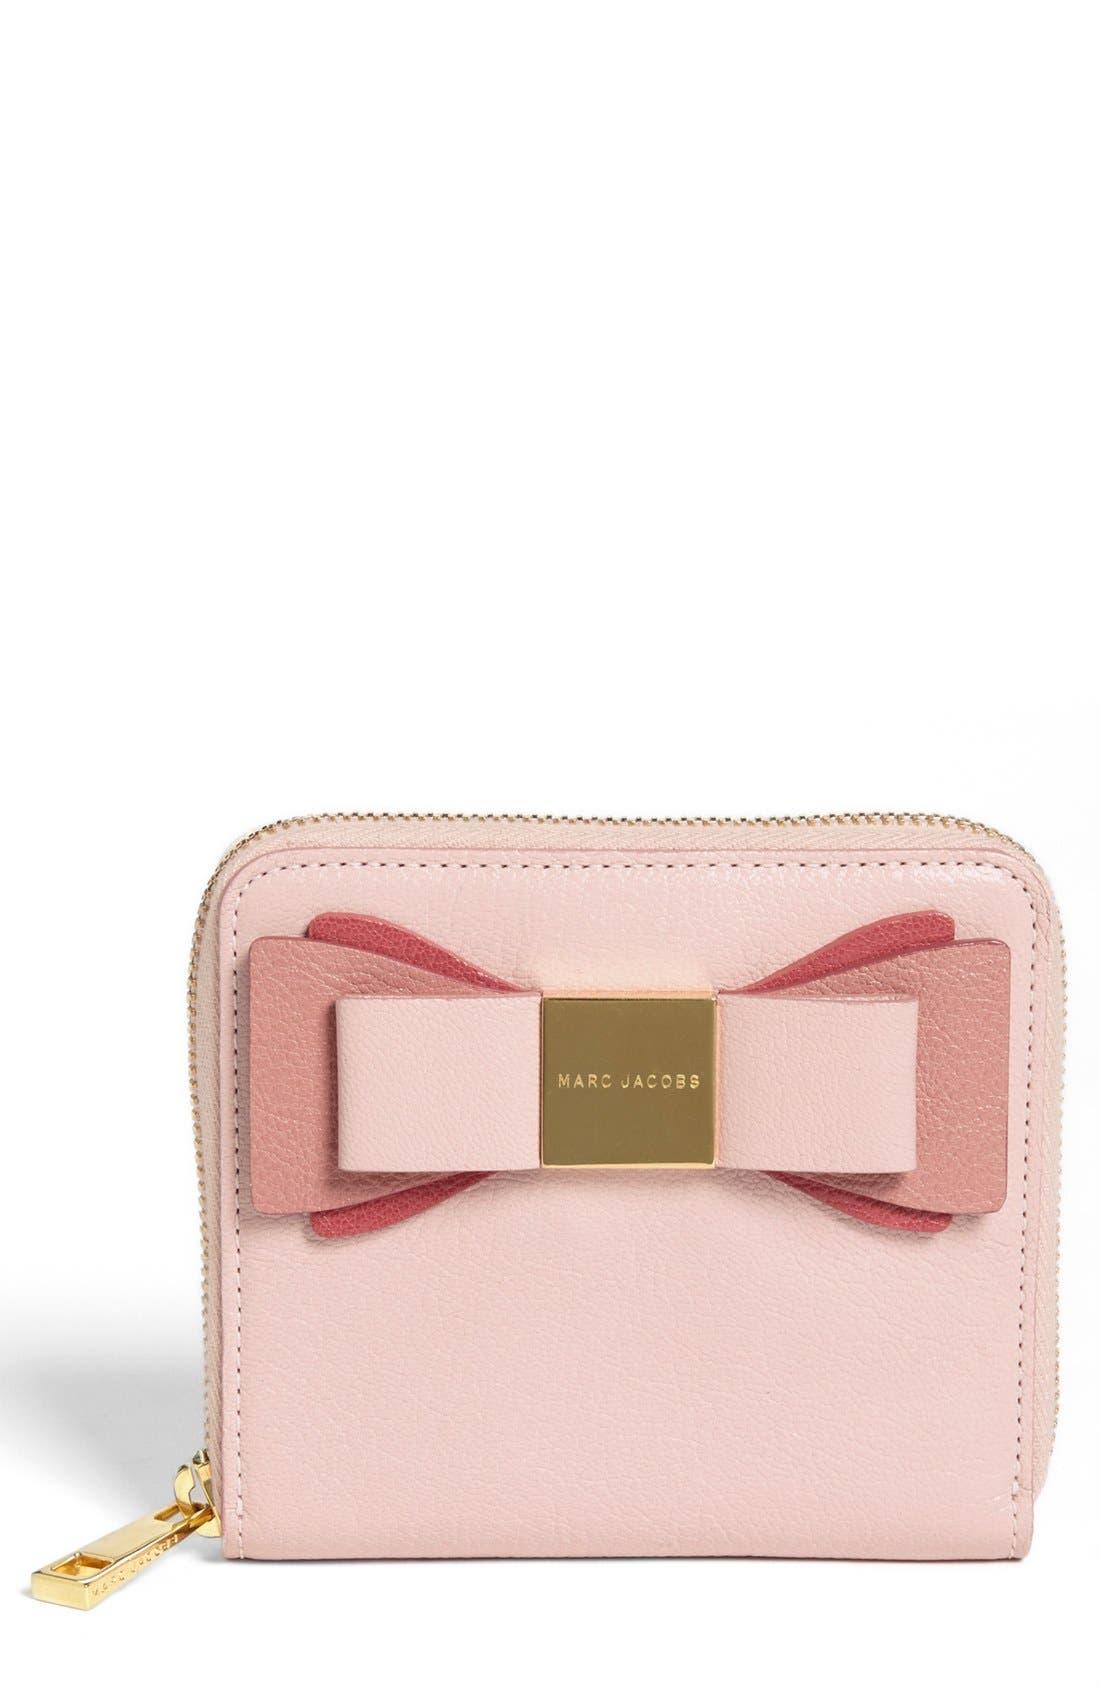 Main Image - MARC JACOBS 'Little Sister' Wallet